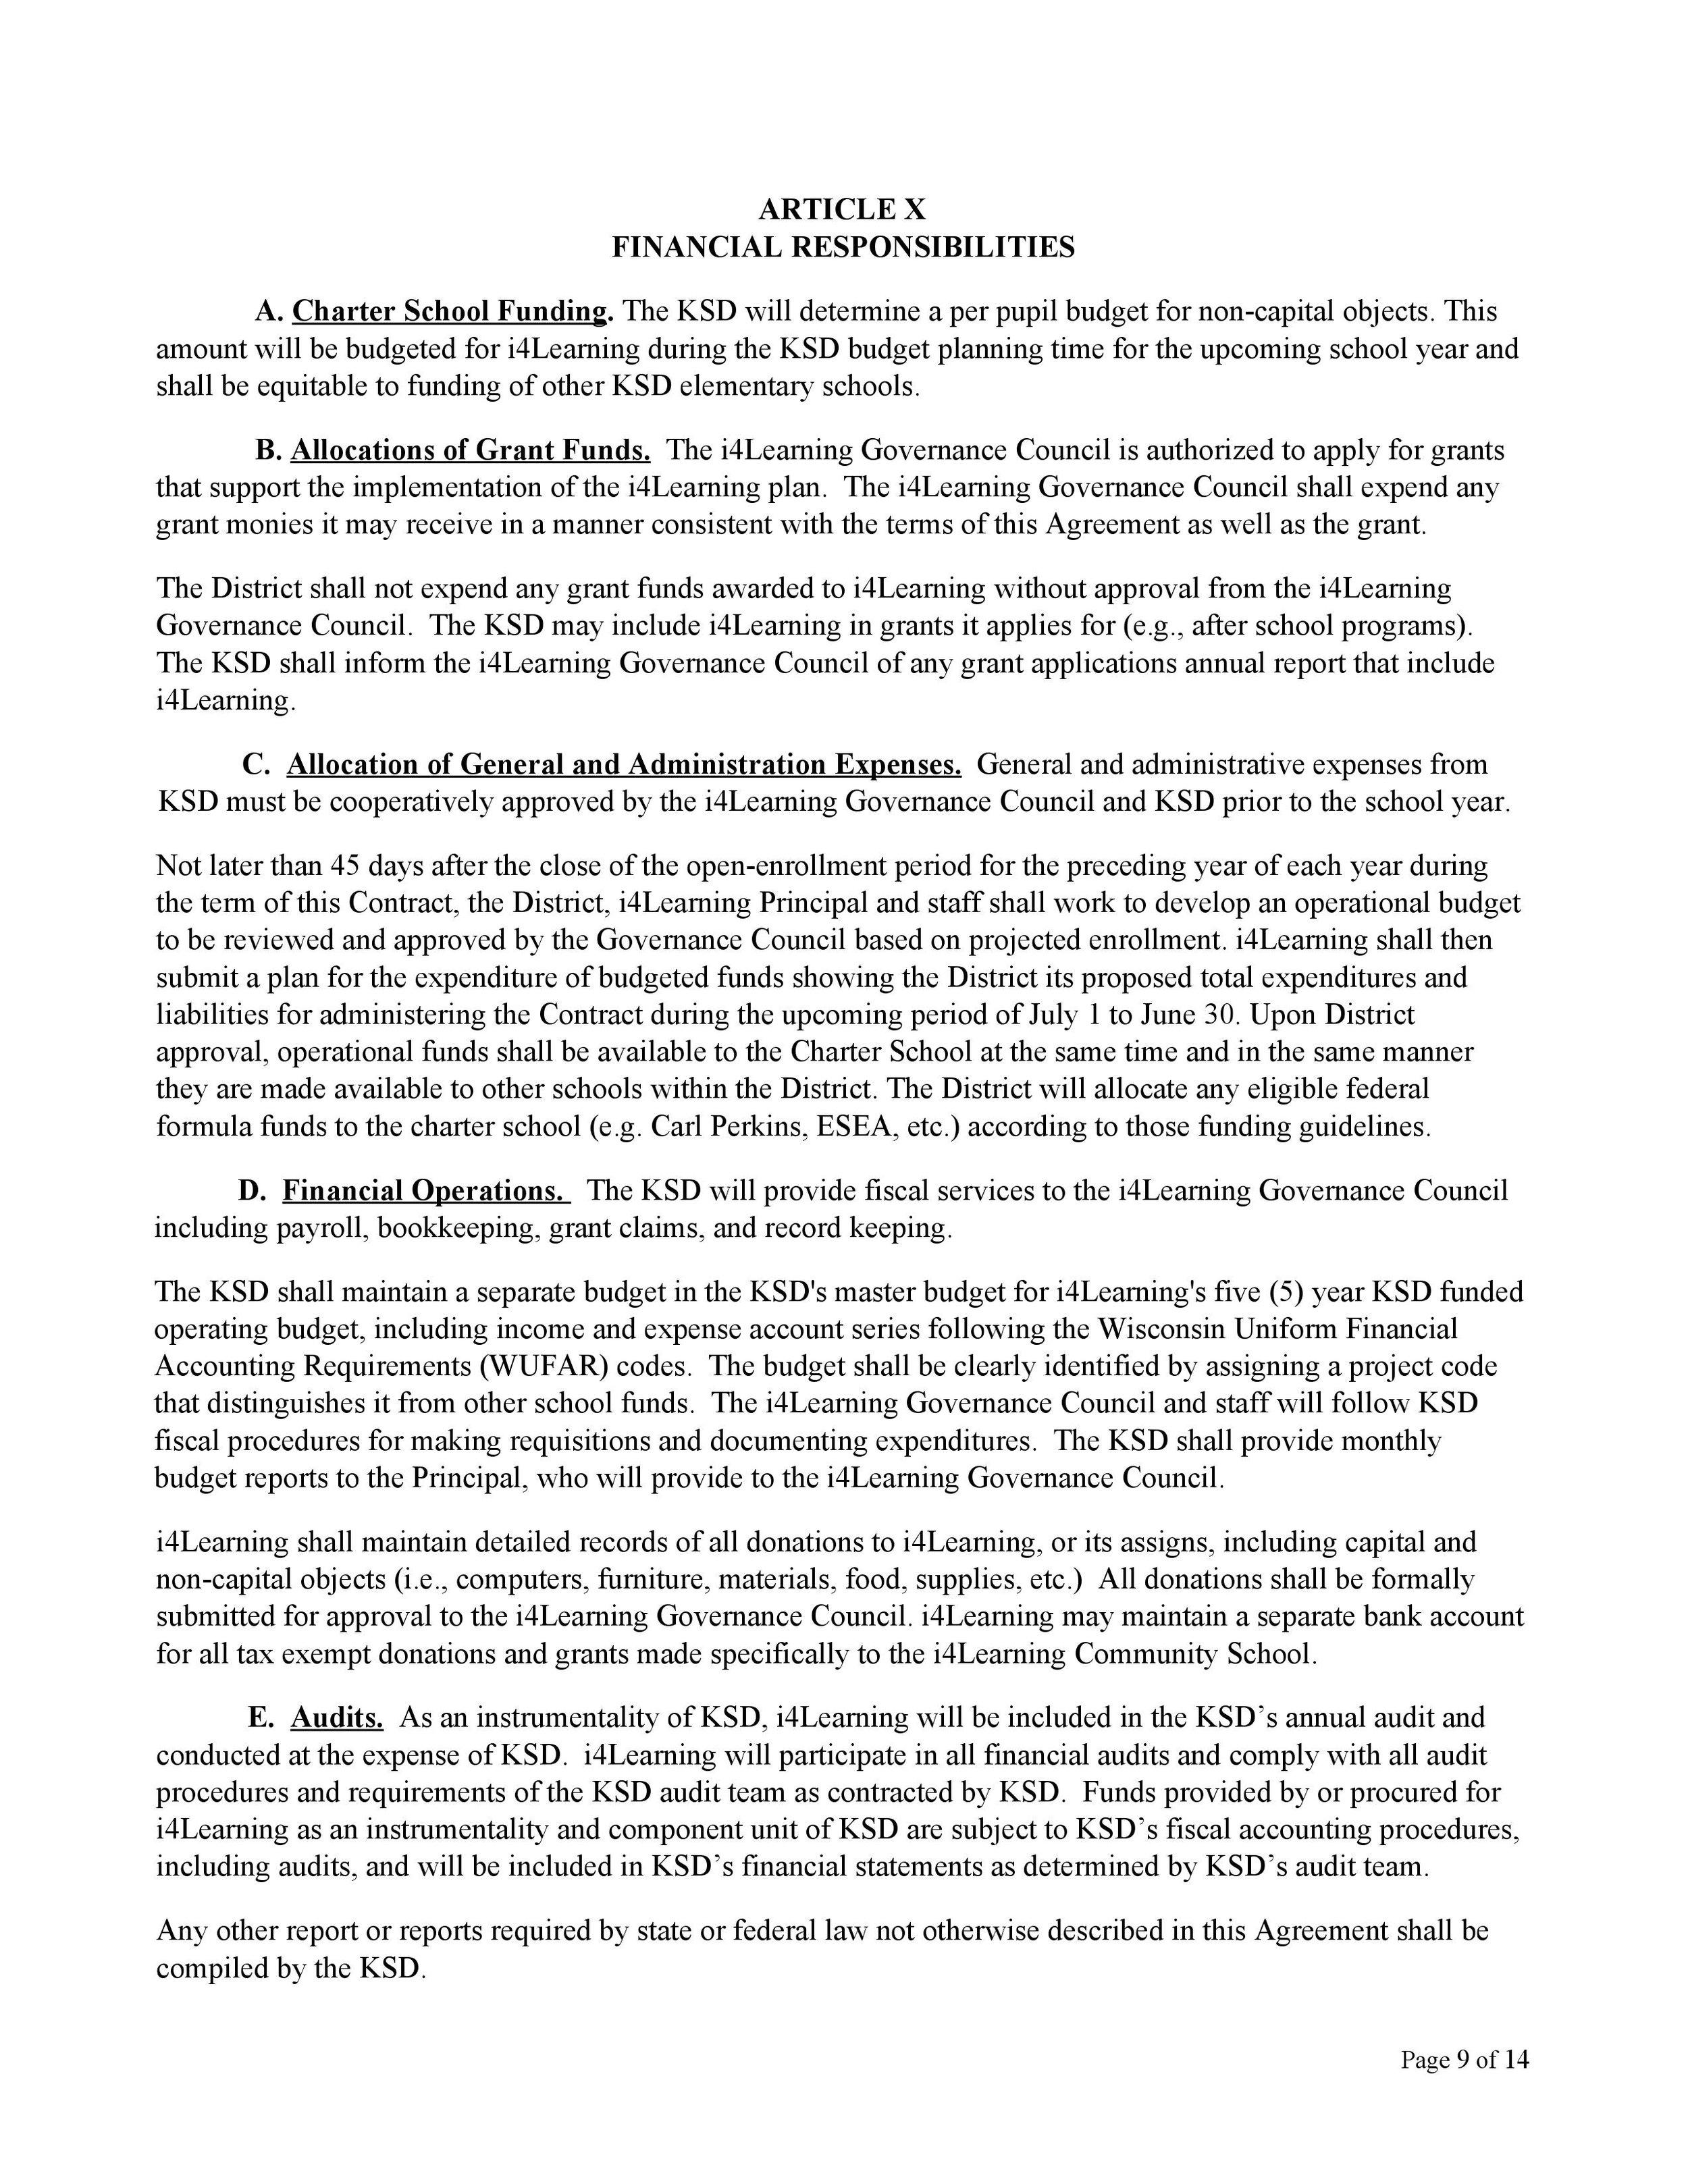 Contract pg 9.jpg